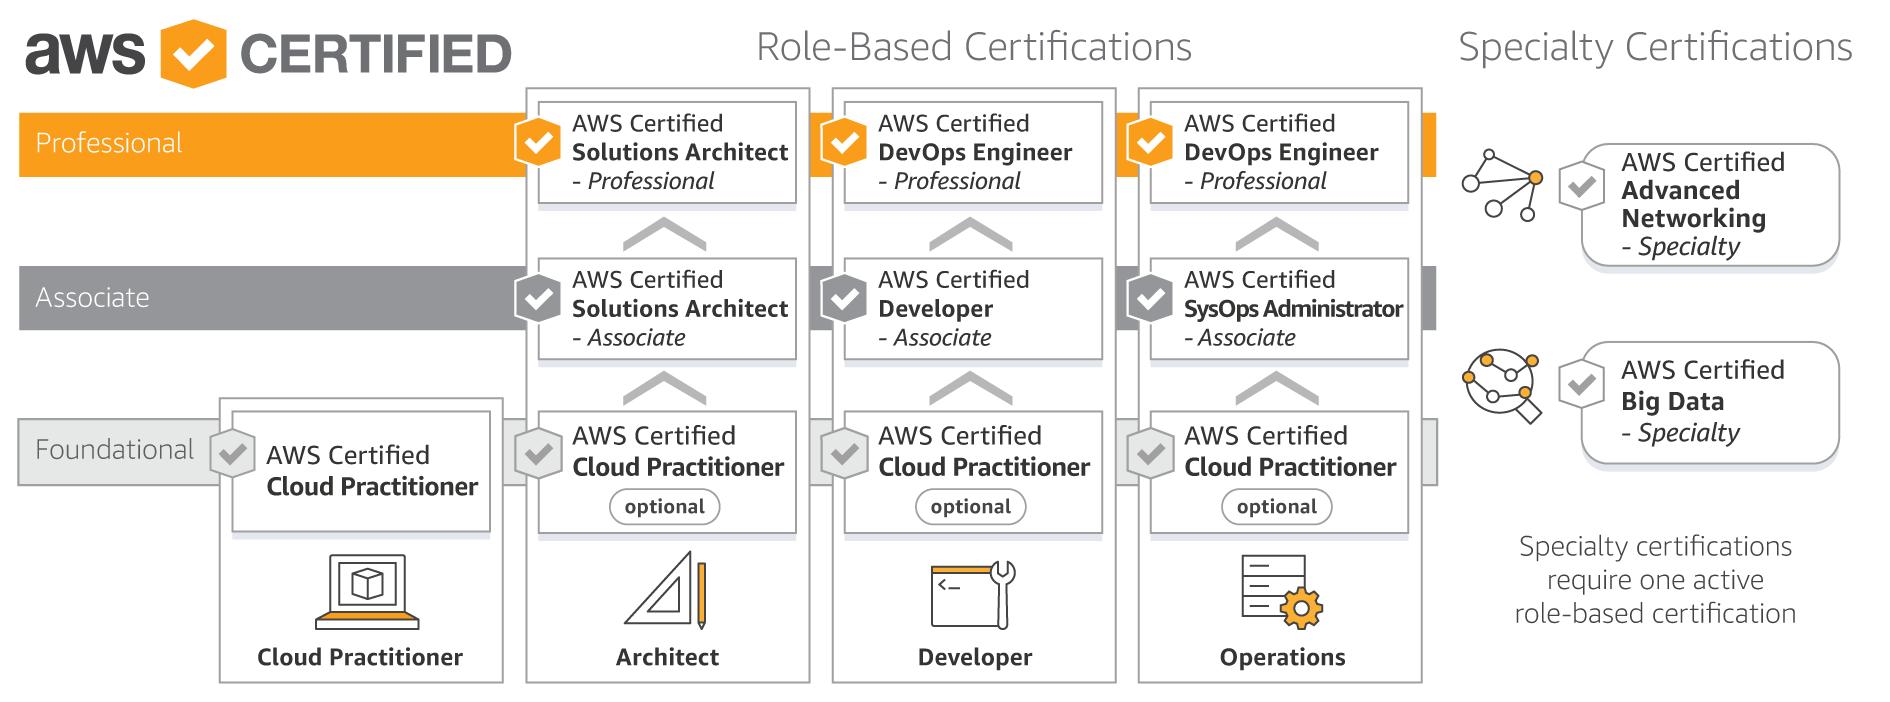 Google cloud platform certification cloud architect gcp 7306705 google cloud platform certification cloud architect gcp 1betcityfo Choice Image